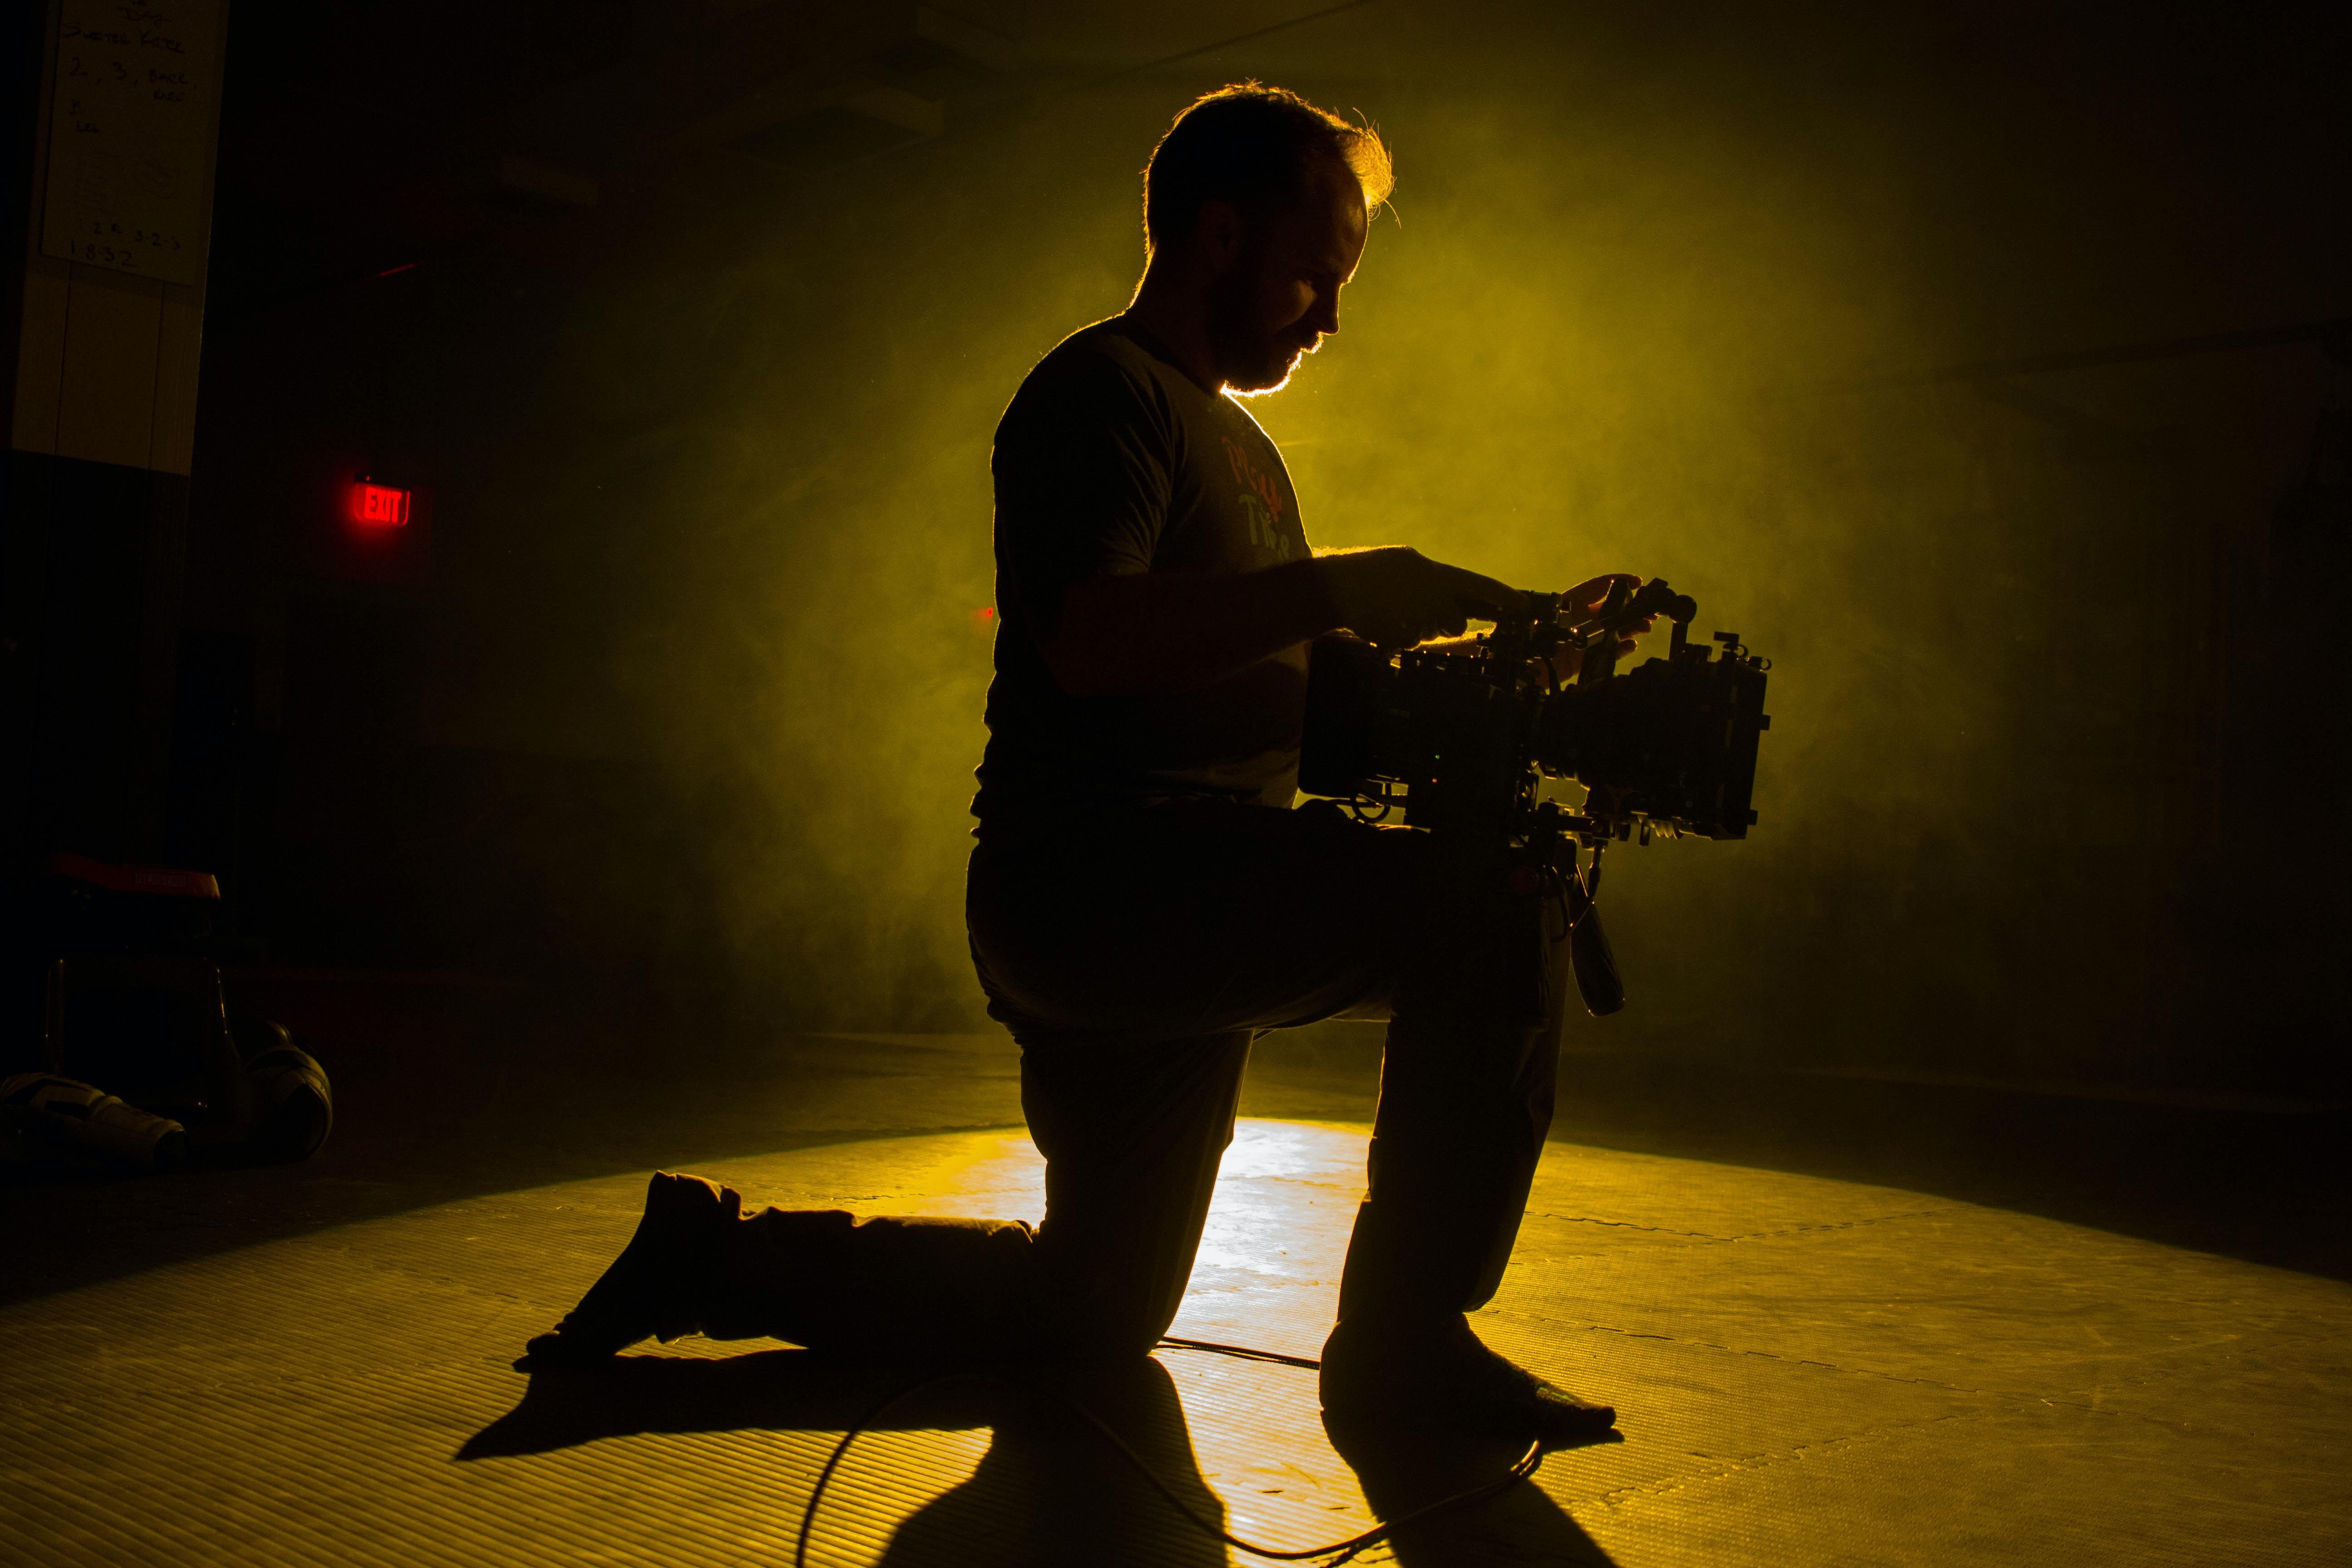 person kneeling while holding camcorder inside dark room